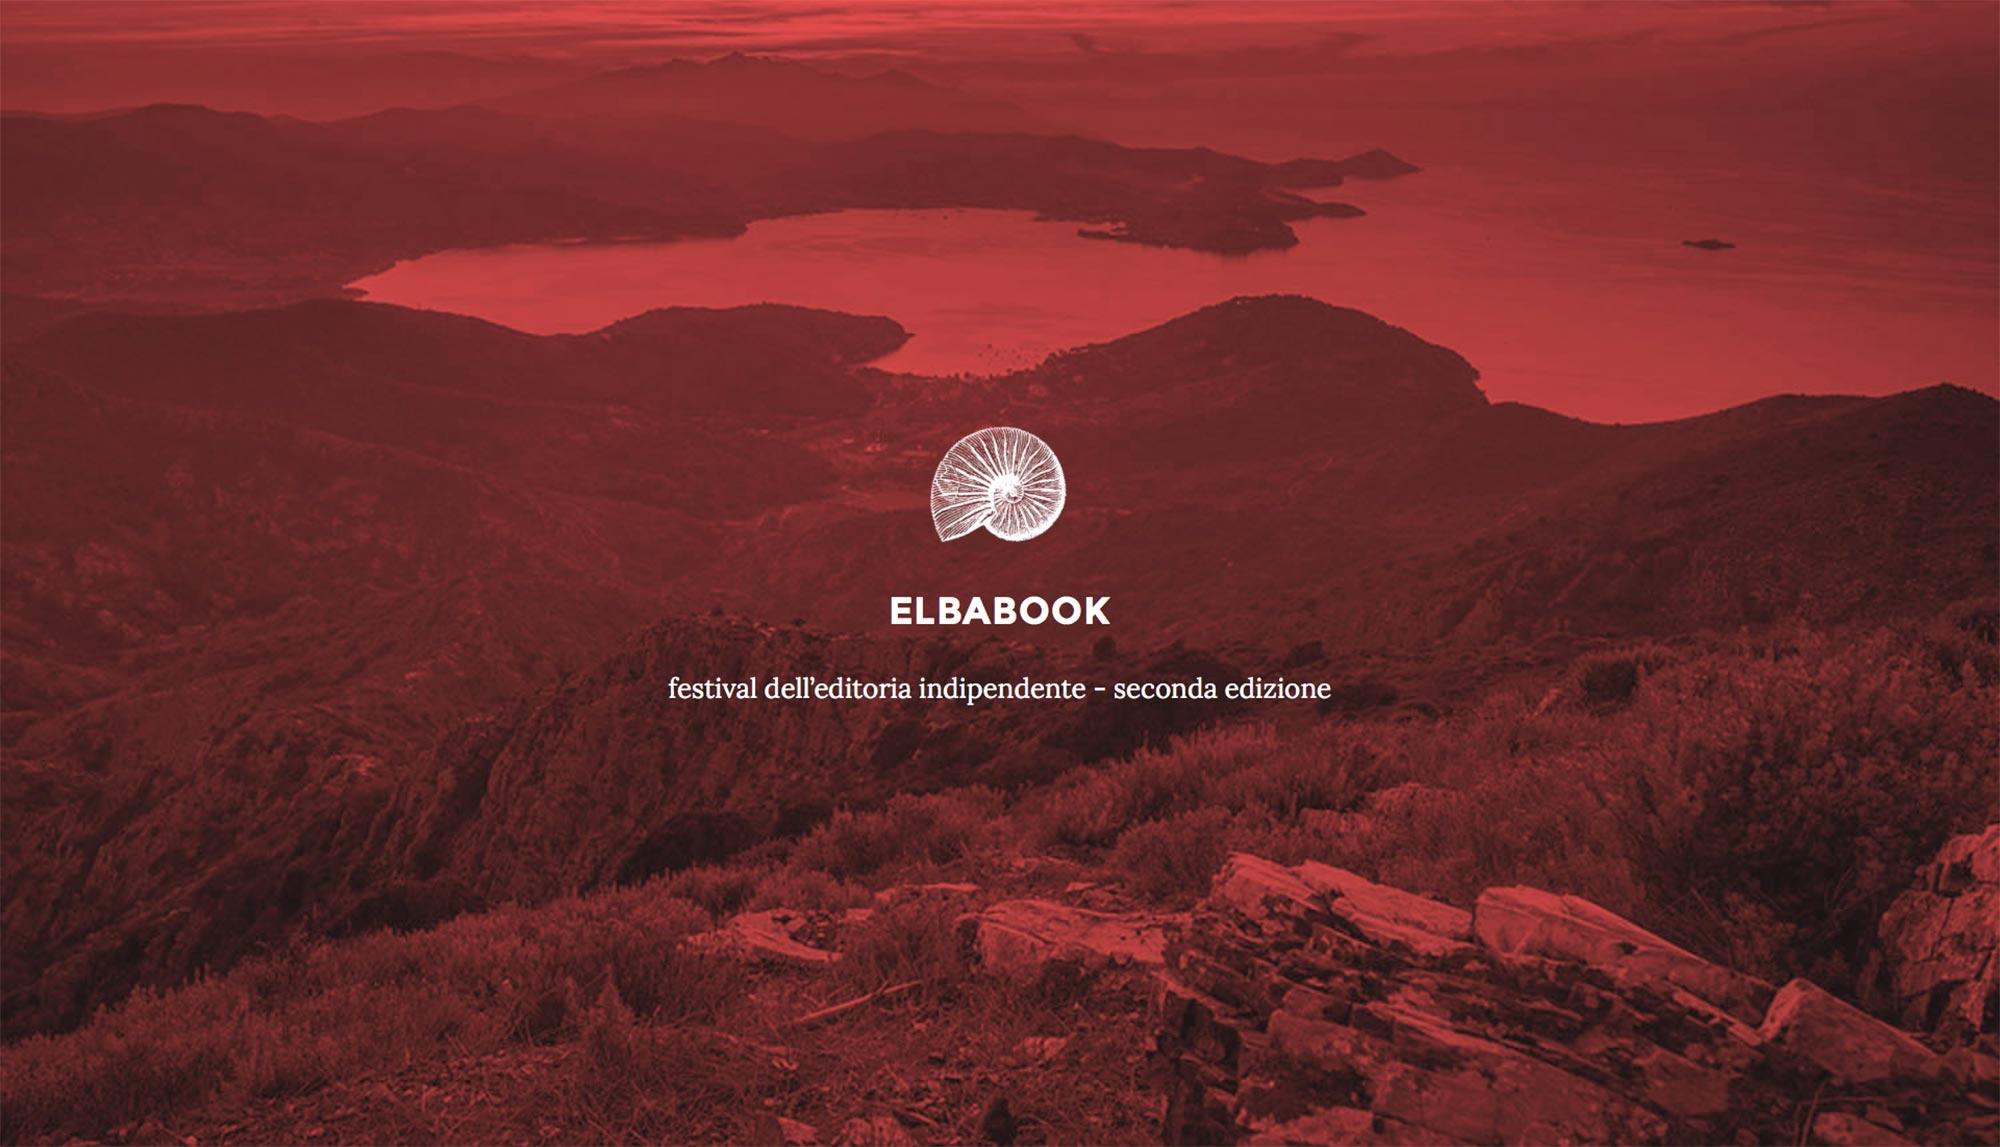 Elbabook